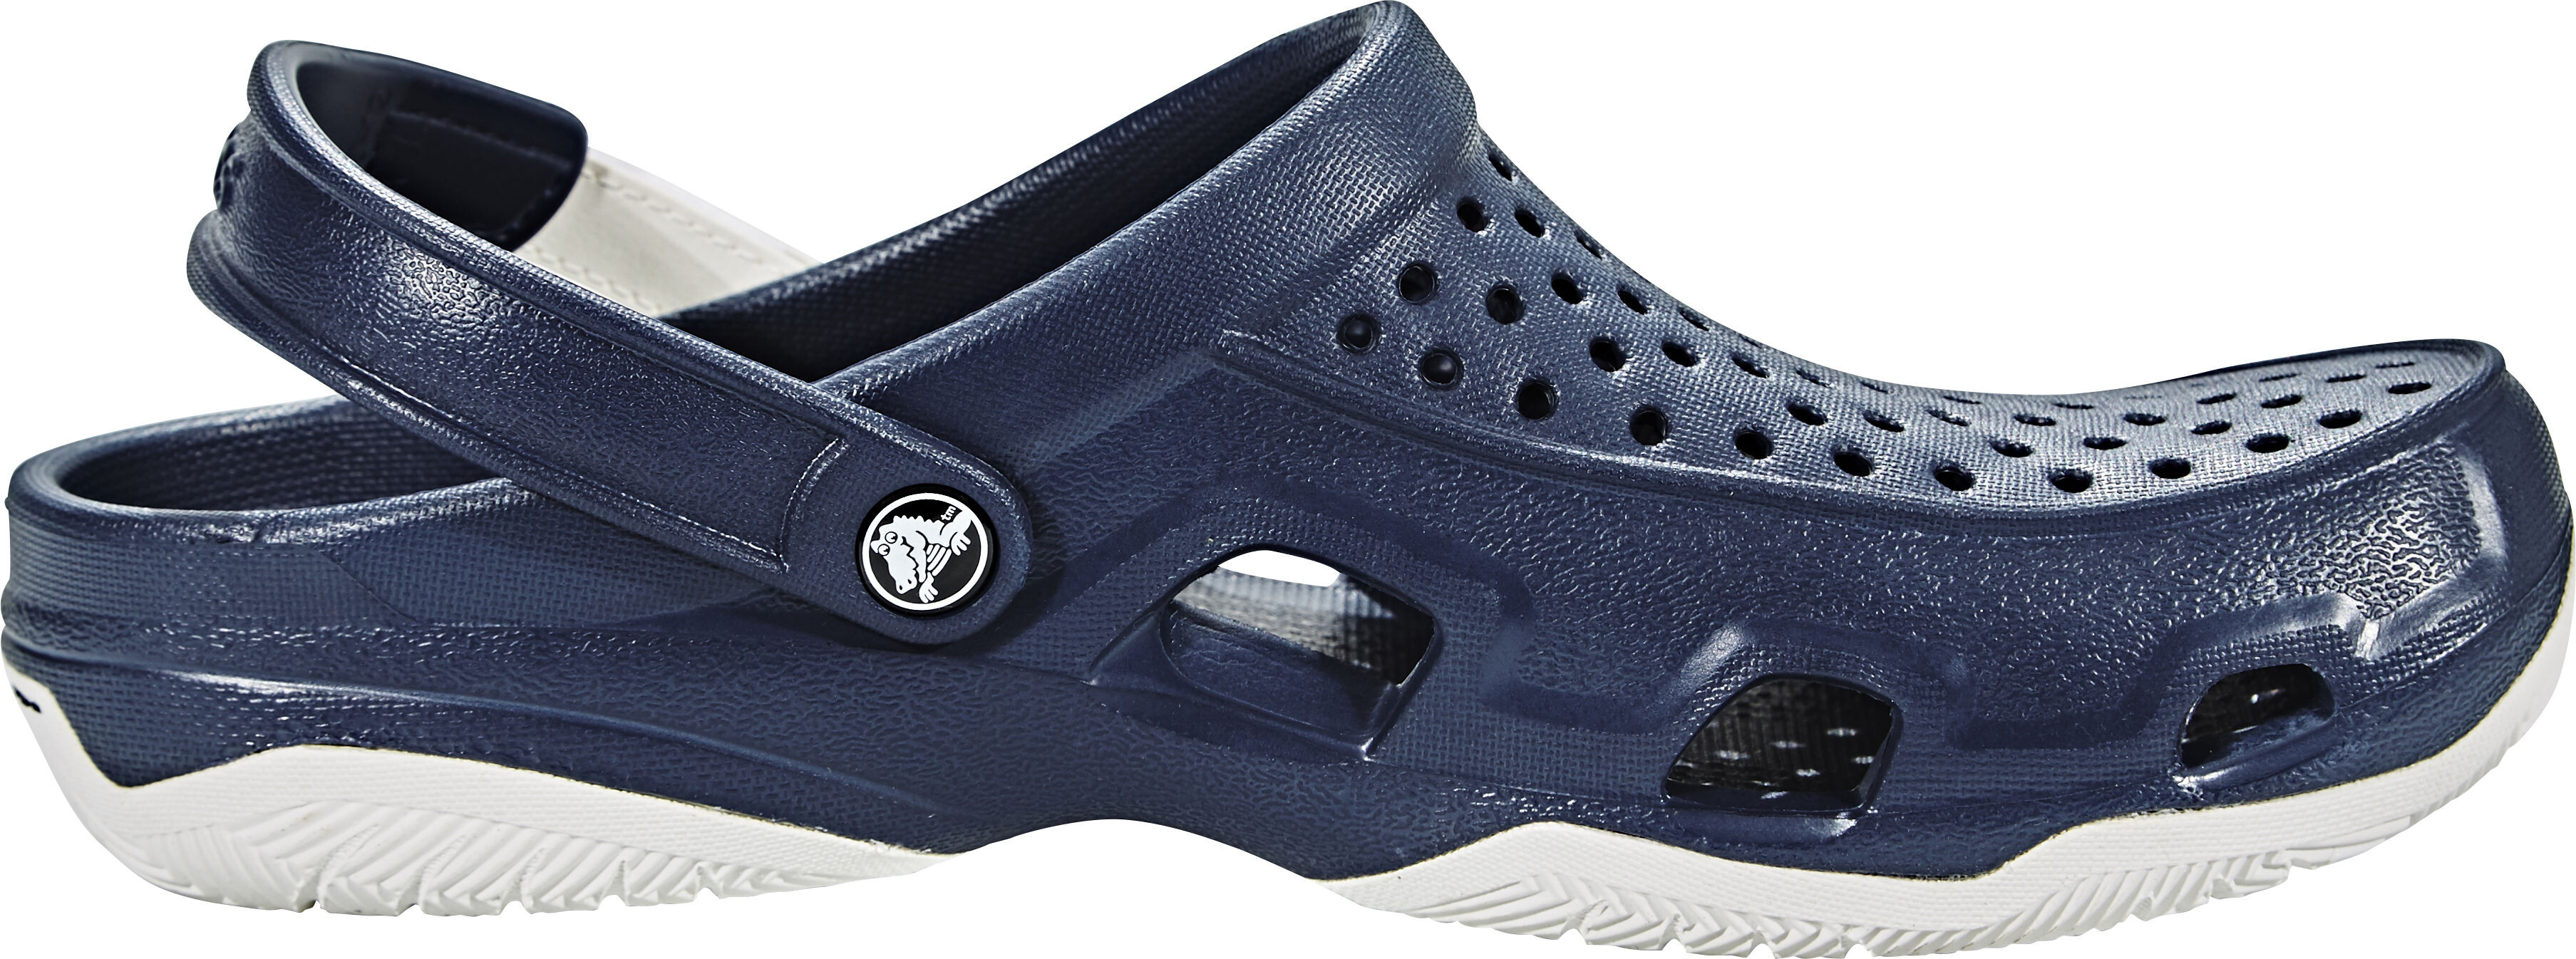 99104b90f244f Crocs Swiftwater Deck Sandals Men blue at Addnature.co.uk